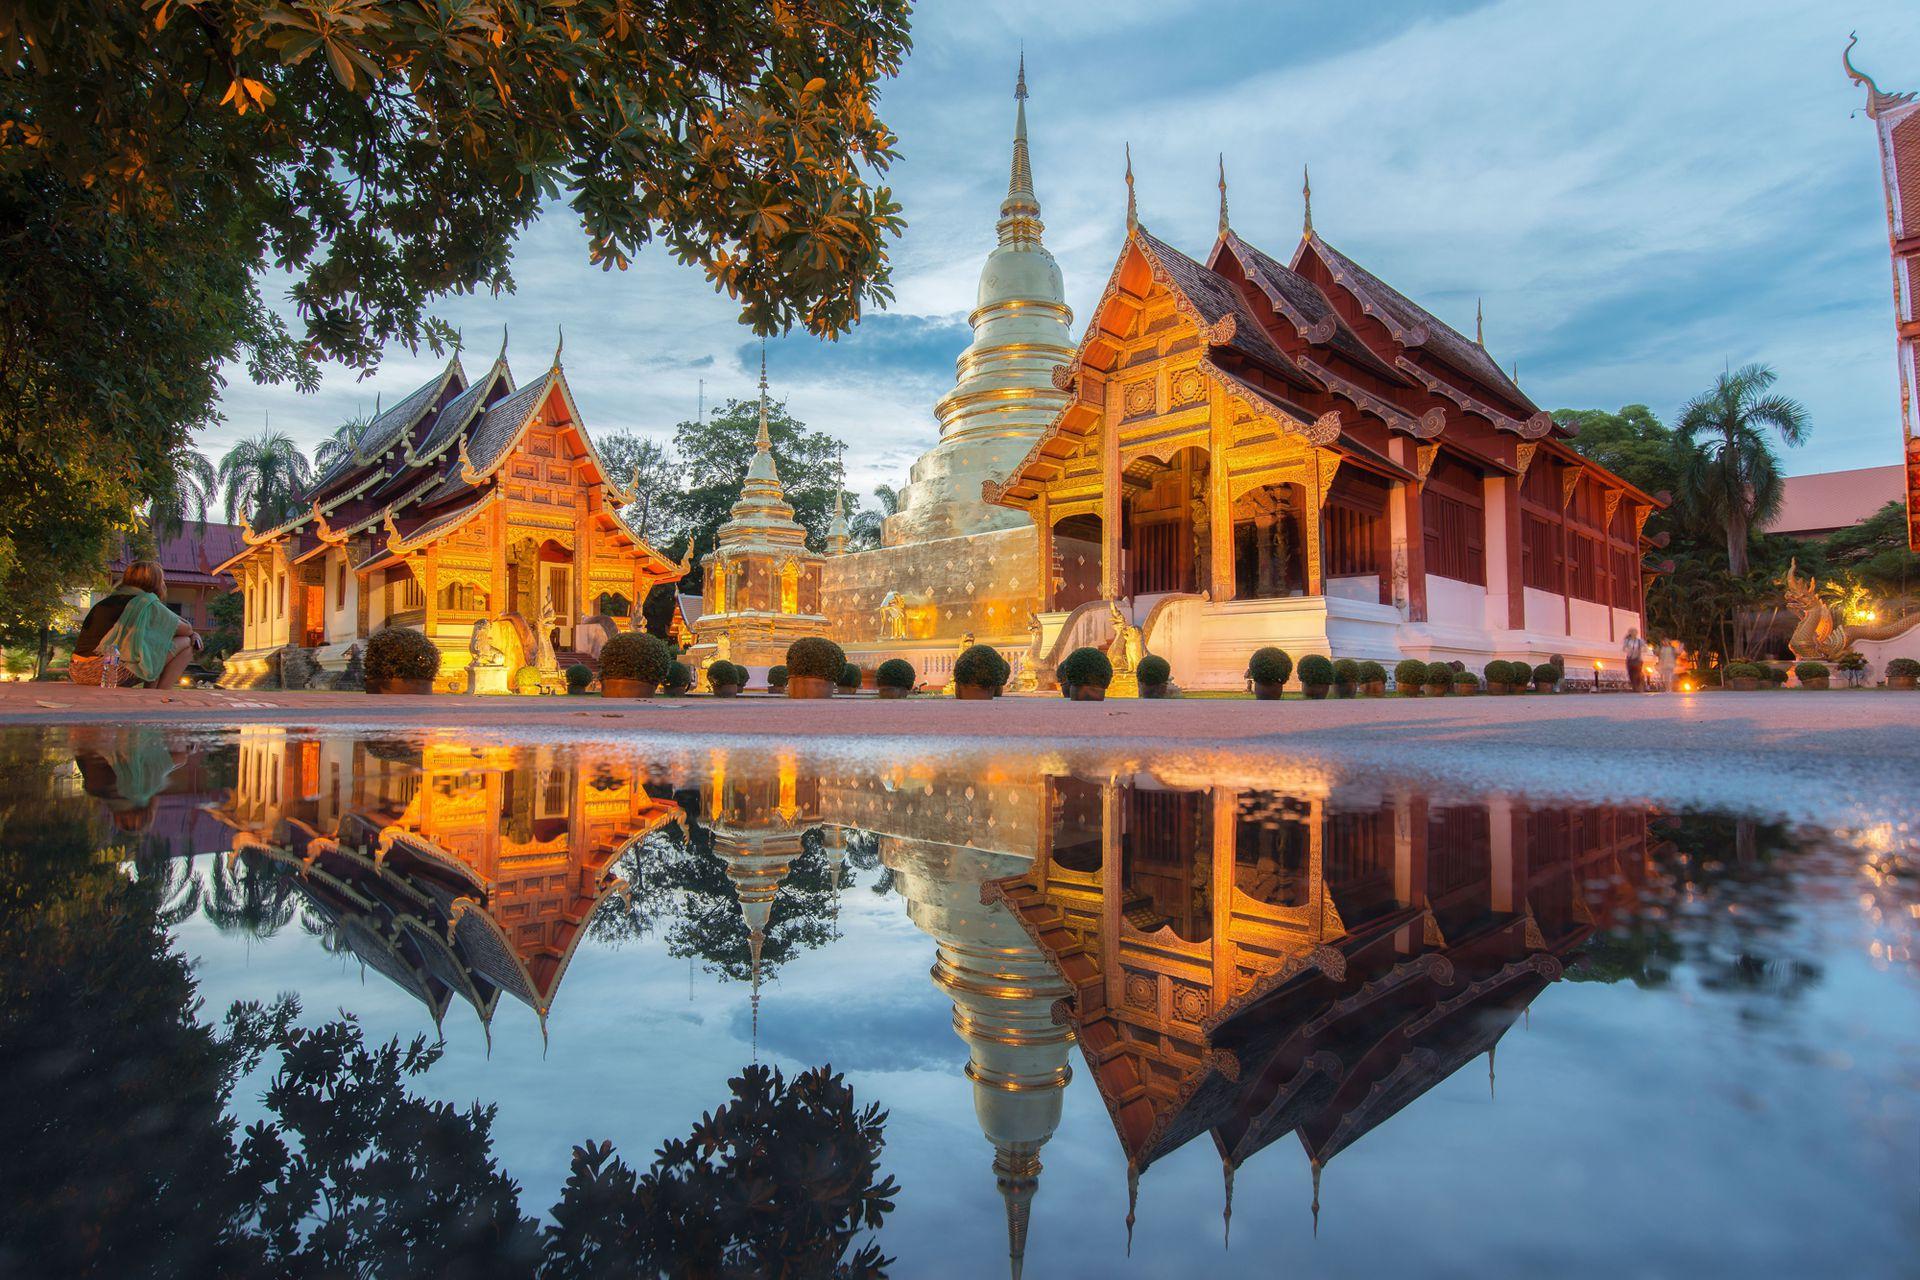 Chiang Mai, al norte del país